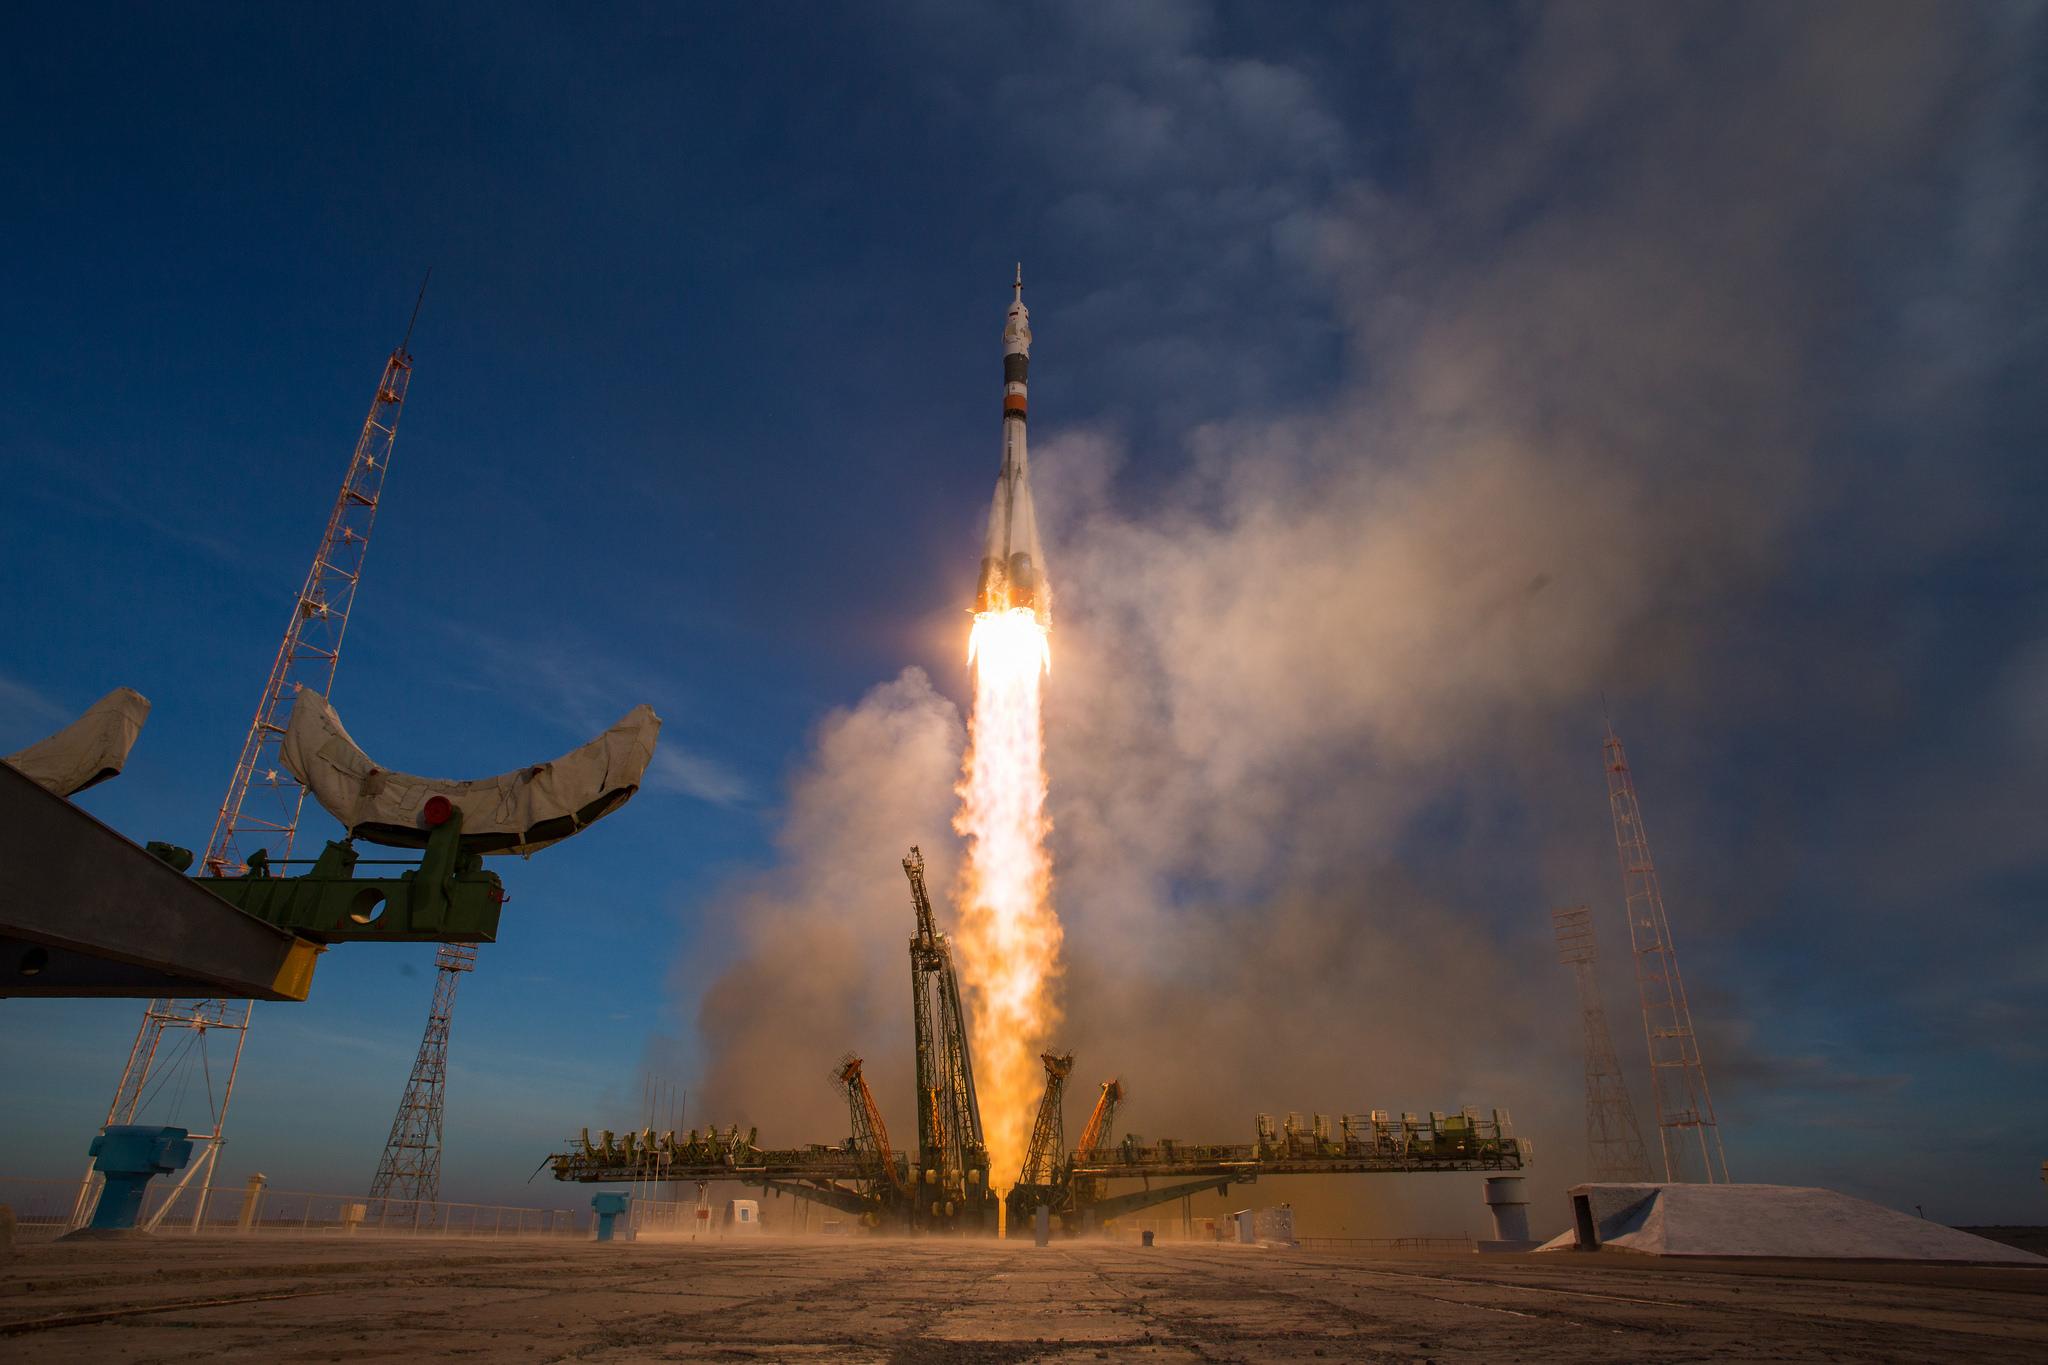 The Soyuz rocket blasted off from the Baikonur Cosmodrome in Kazakhstan.